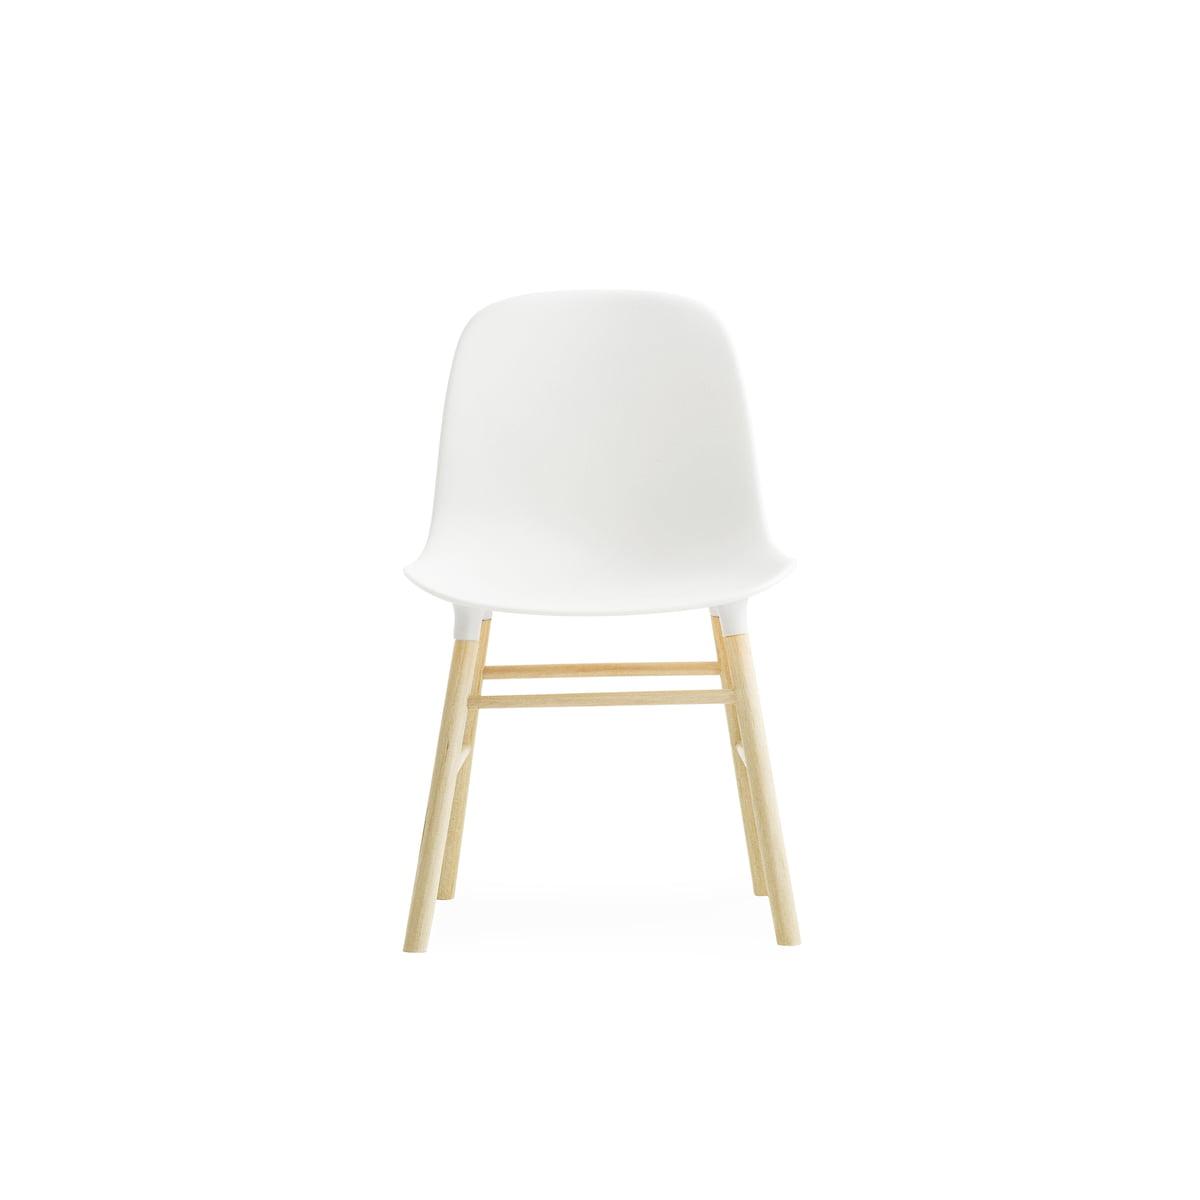 Form Chair Miniature By Normann Copenhagen Made Of Oak In White